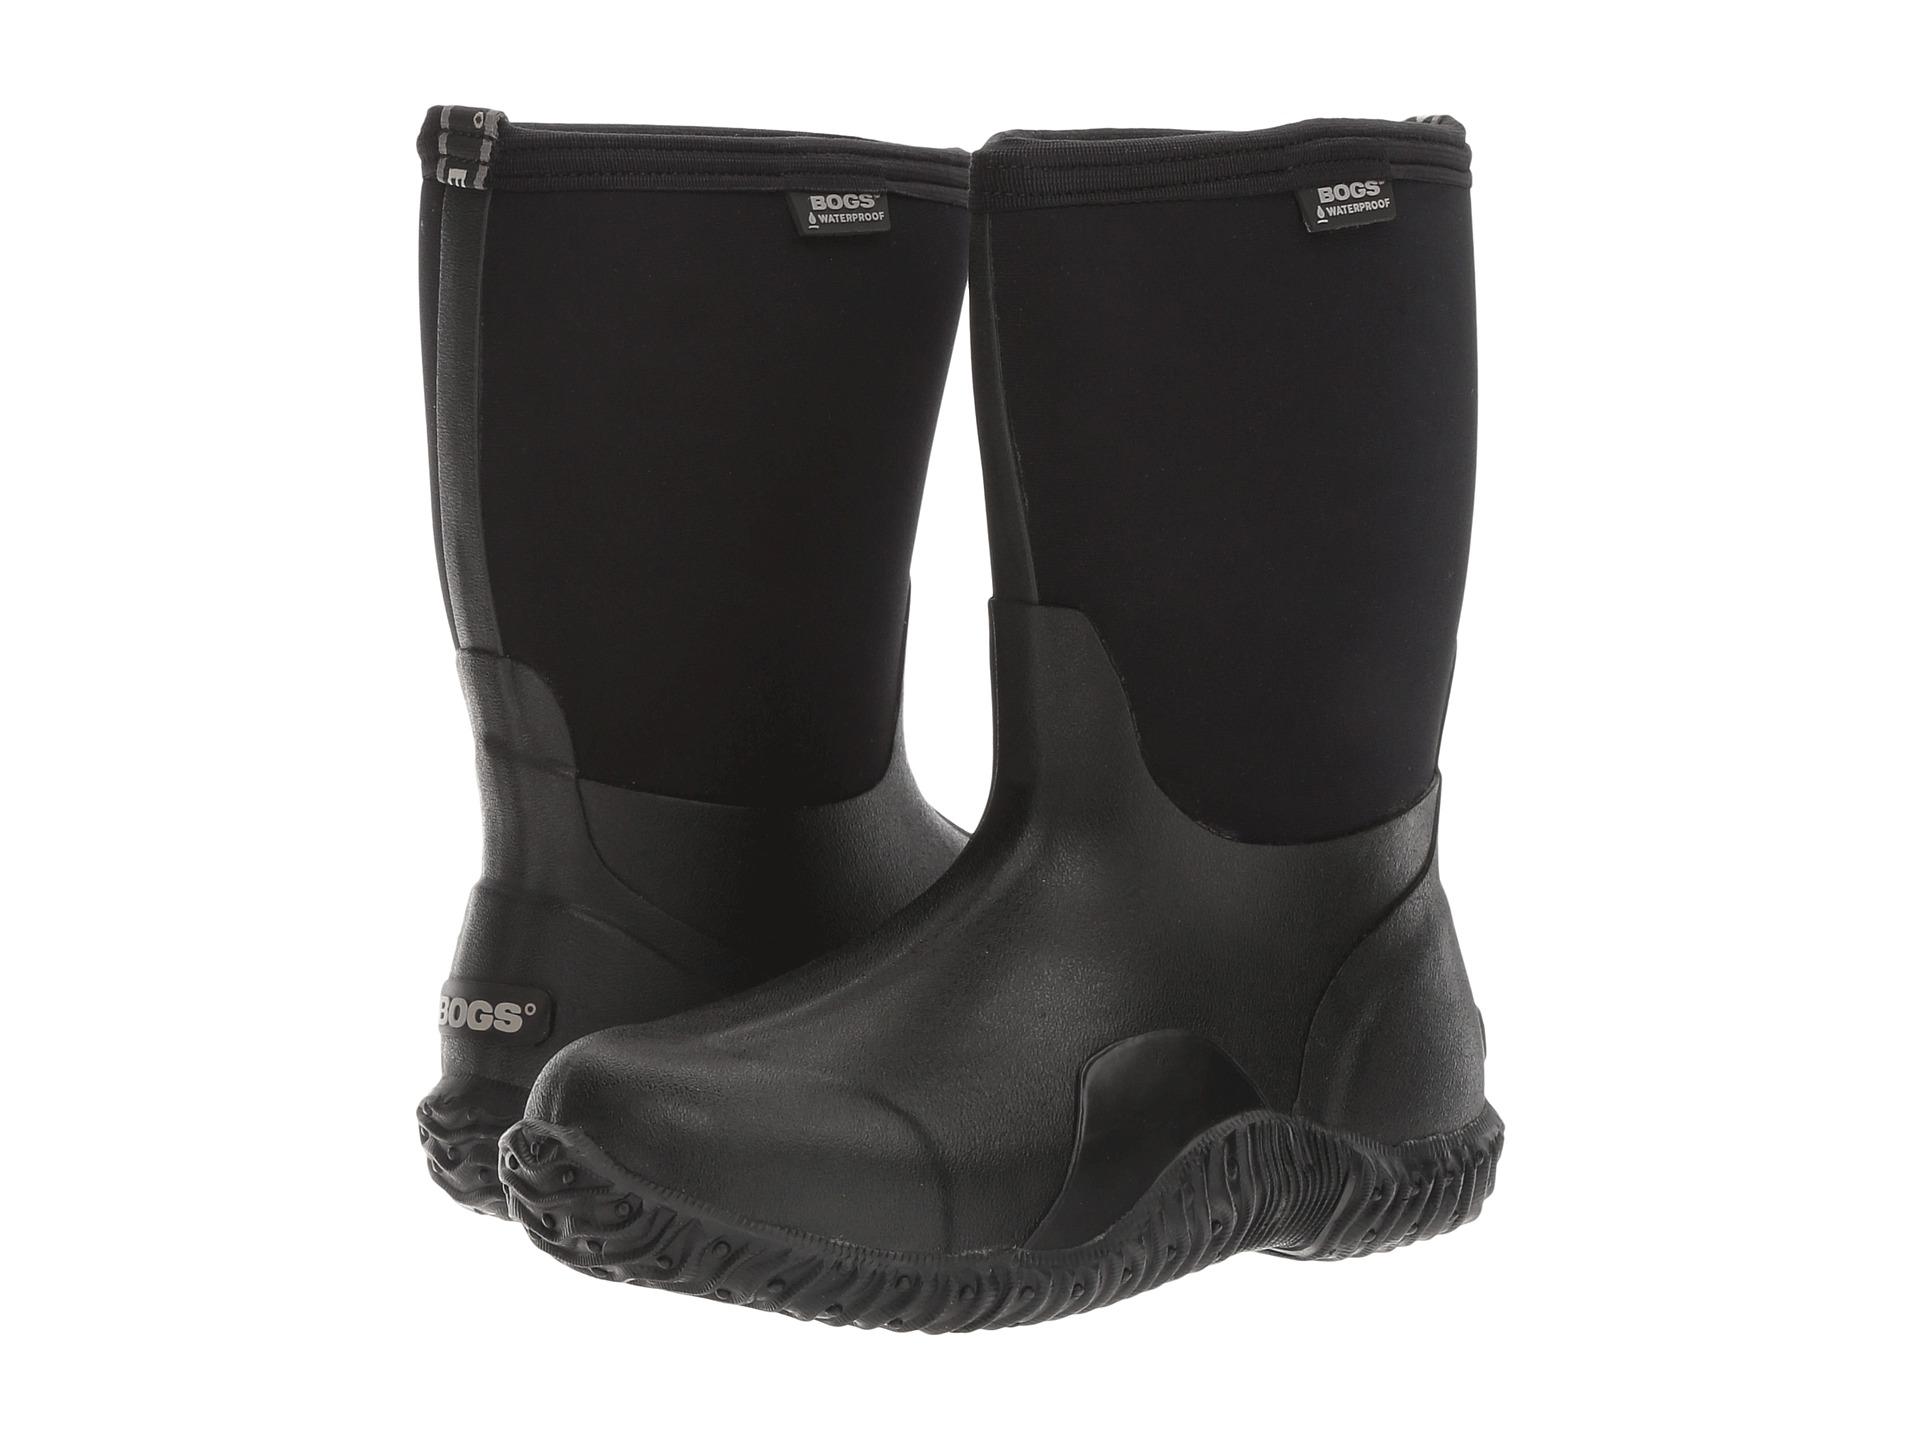 Extra Wide Width Mens Snow Boots | Homewood Mountain Ski Resort